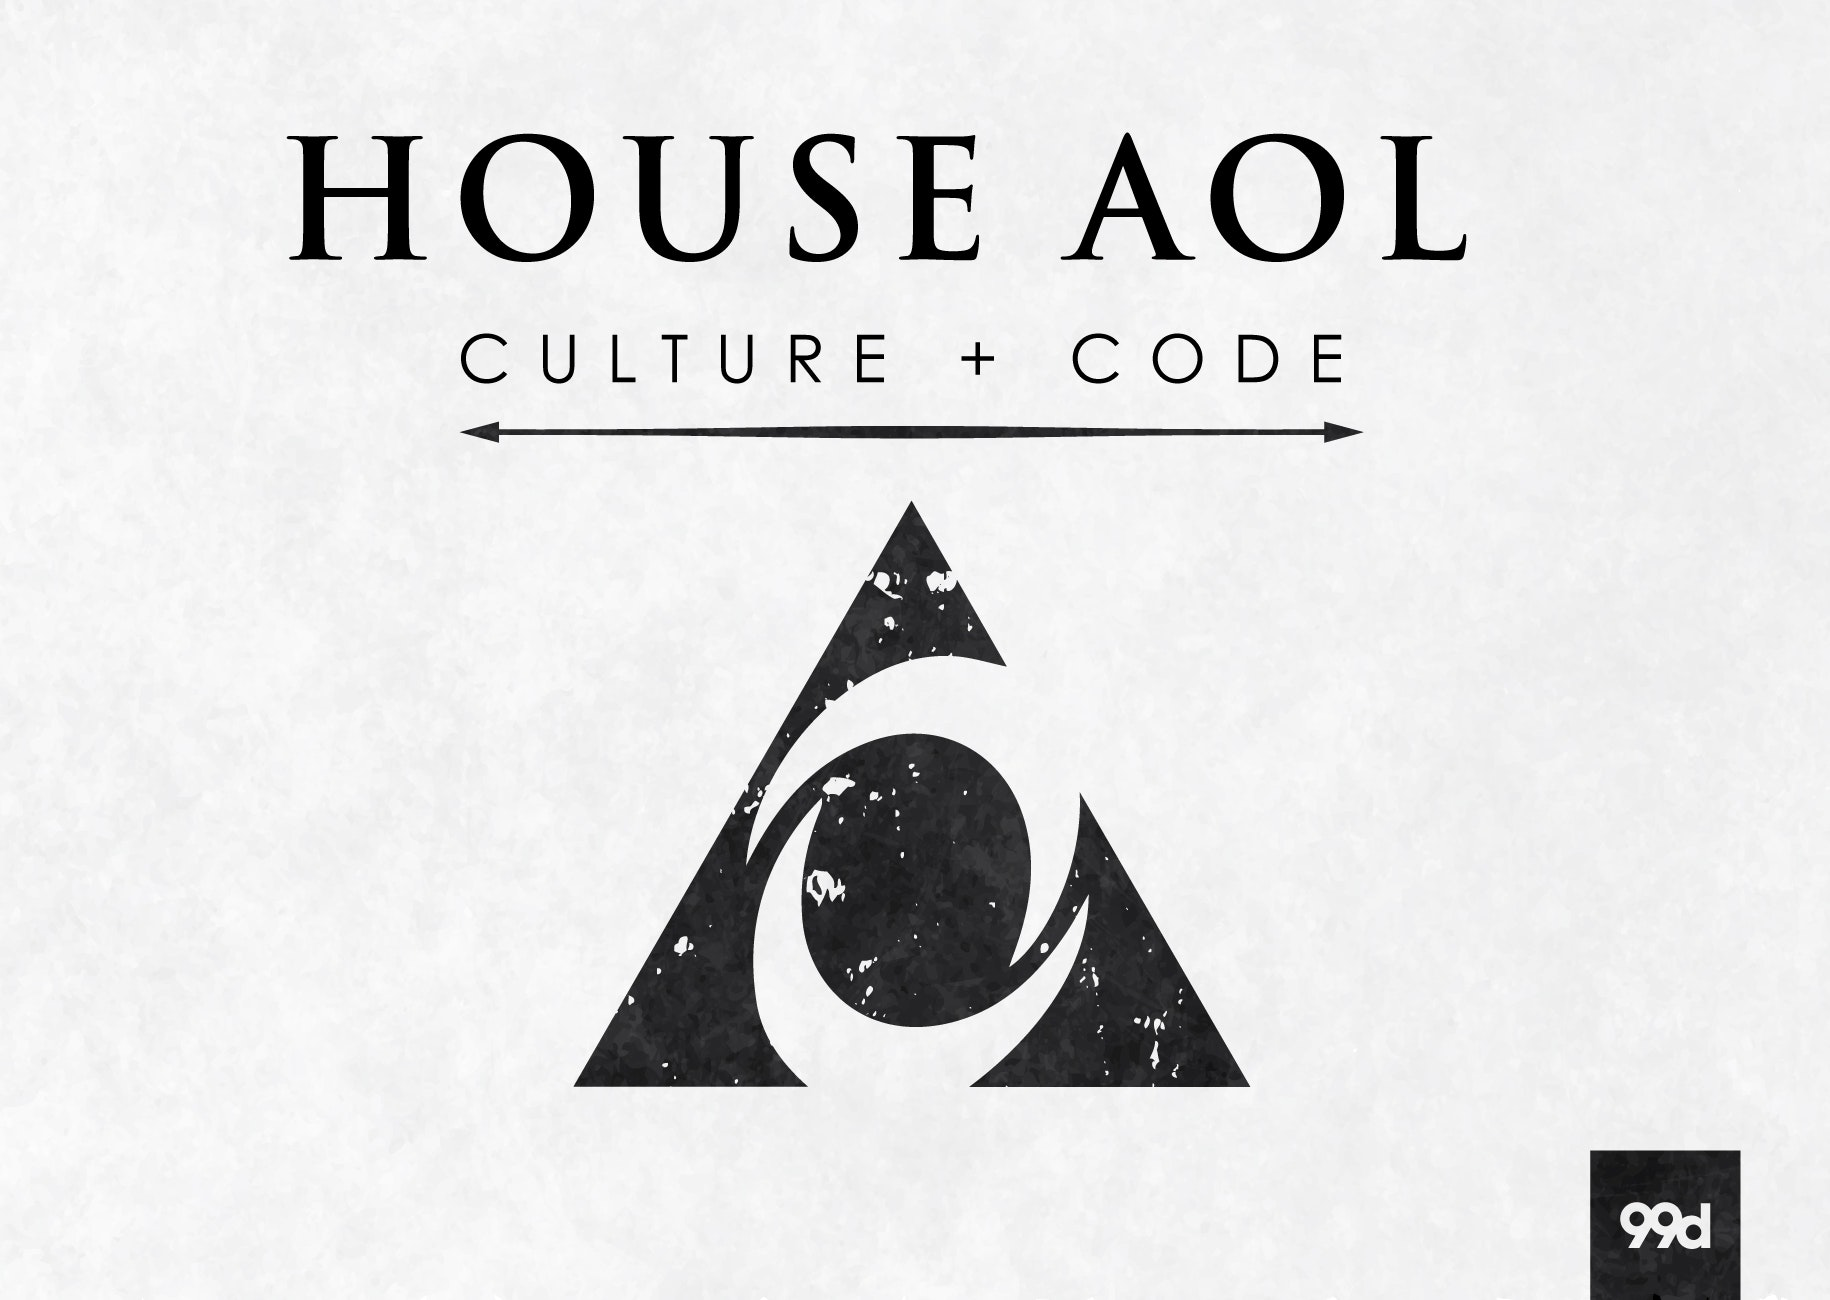 House AOL Barathean Game of Thrones